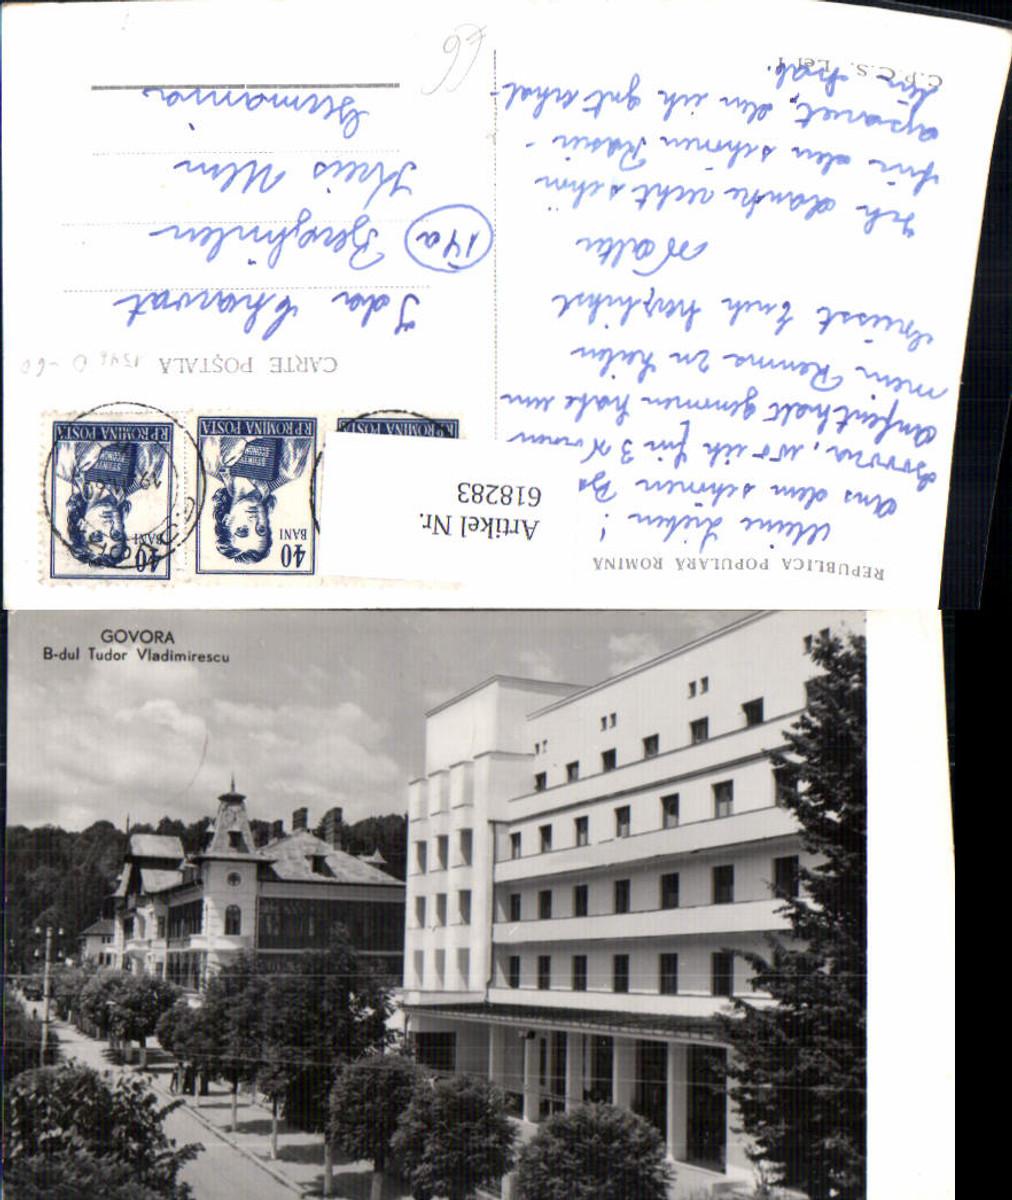 618283,Foto Ak Baile Govora Govora B-dul Tudor Vladimirescu Romania günstig online kaufen